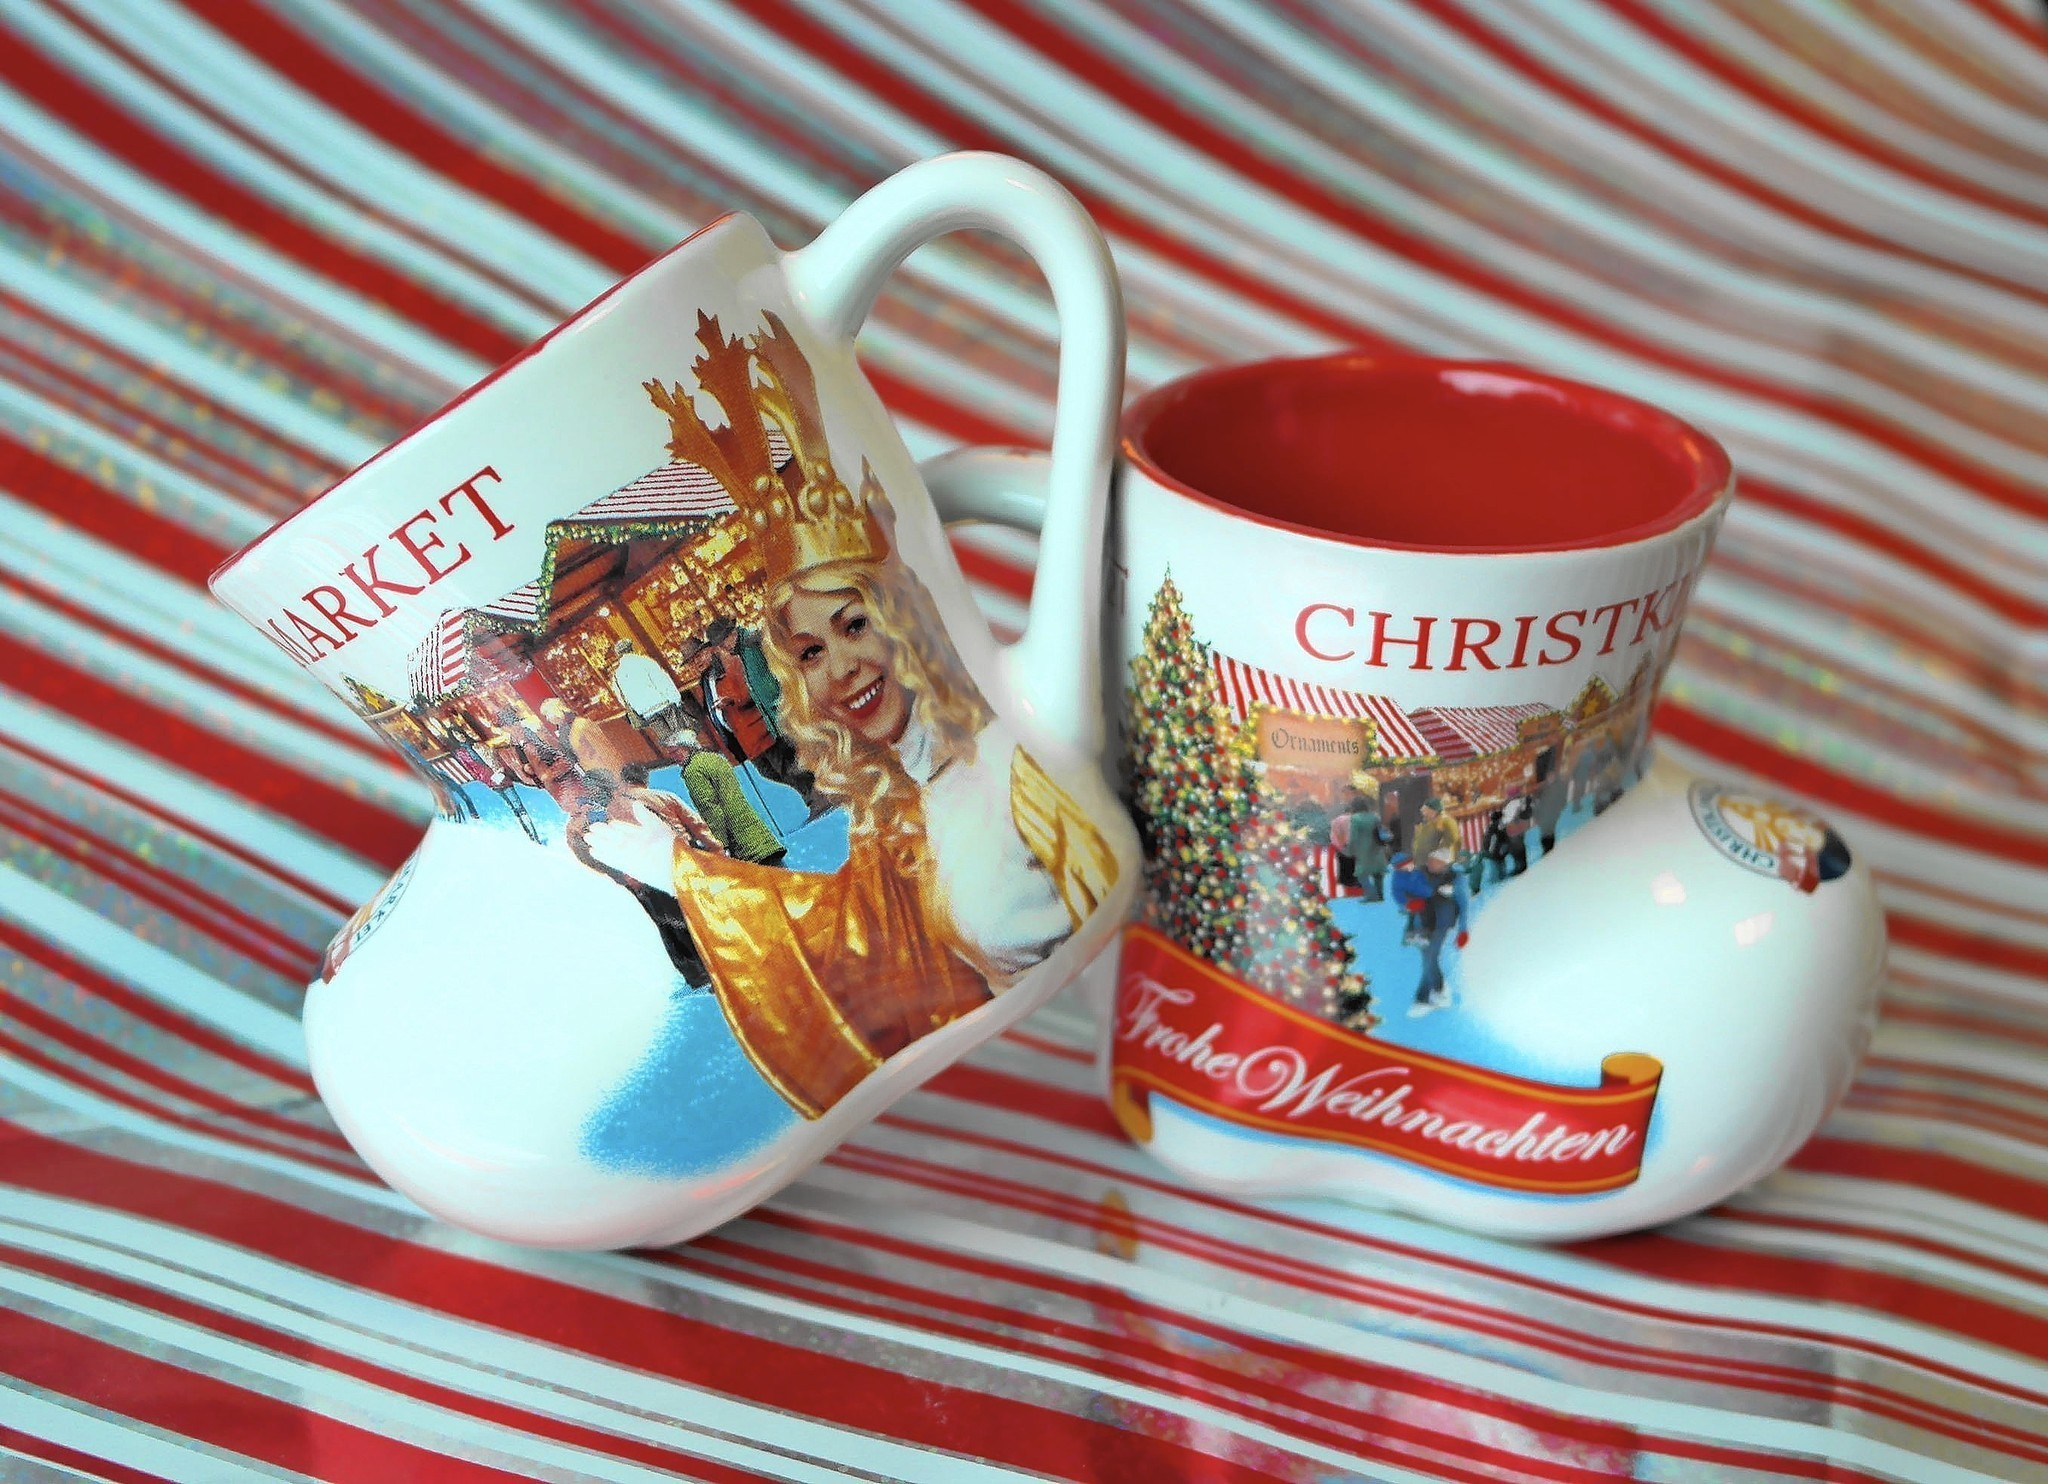 Chicago The Christkindlmarket Boot Mug Returns Christmas